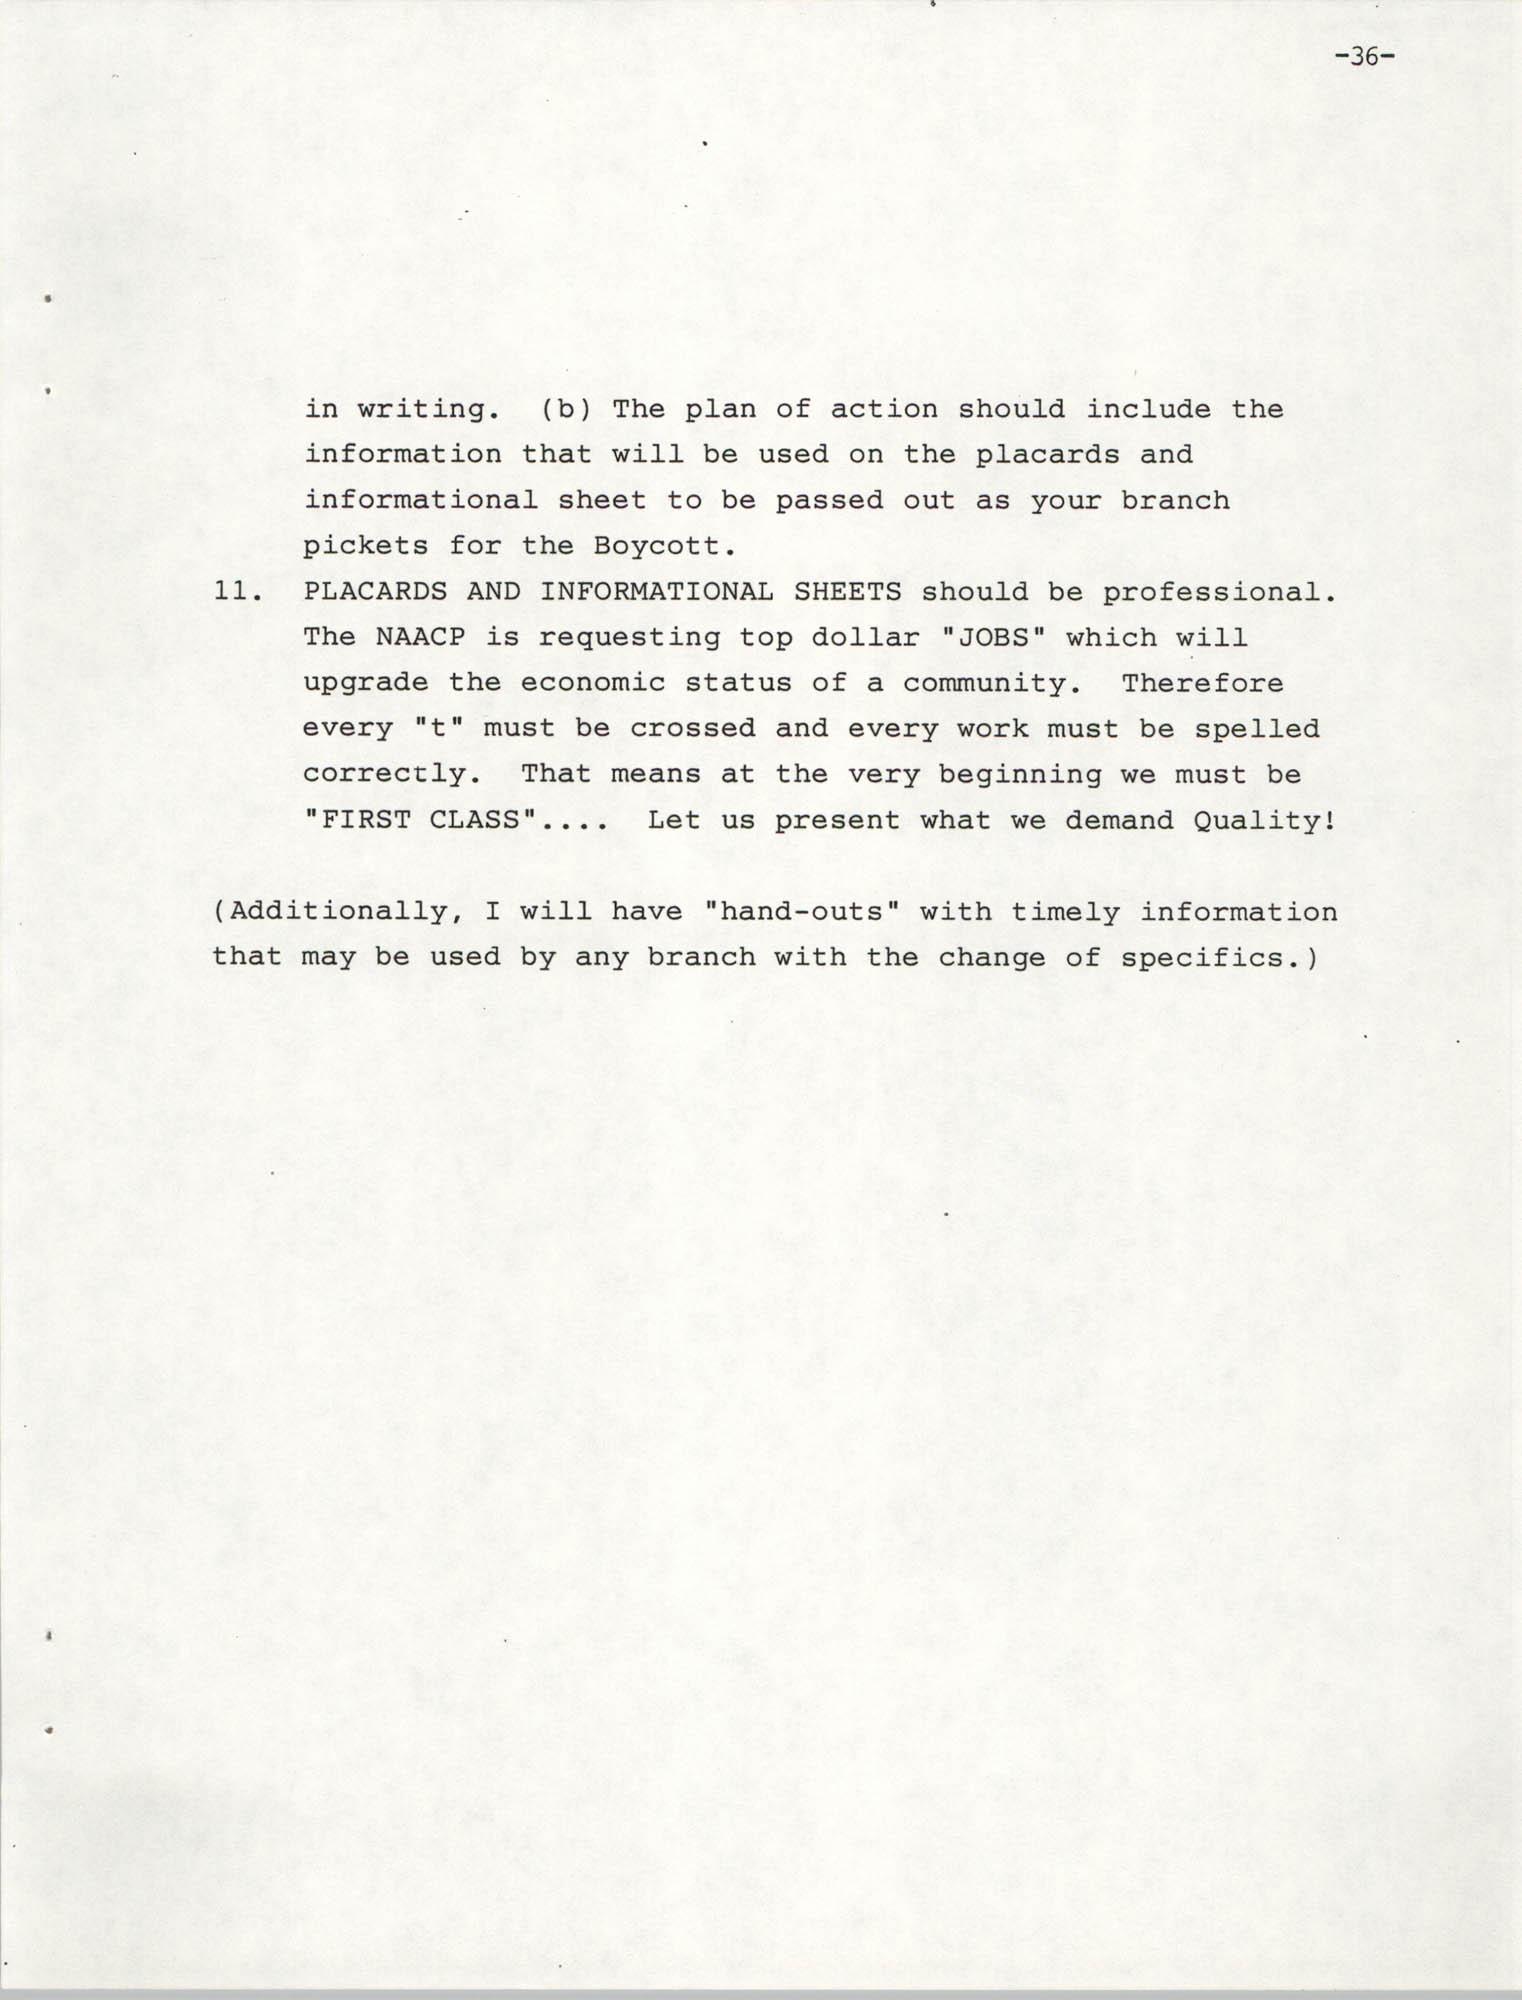 NAACP Mandatory Training Handbook, 1989, Page 36